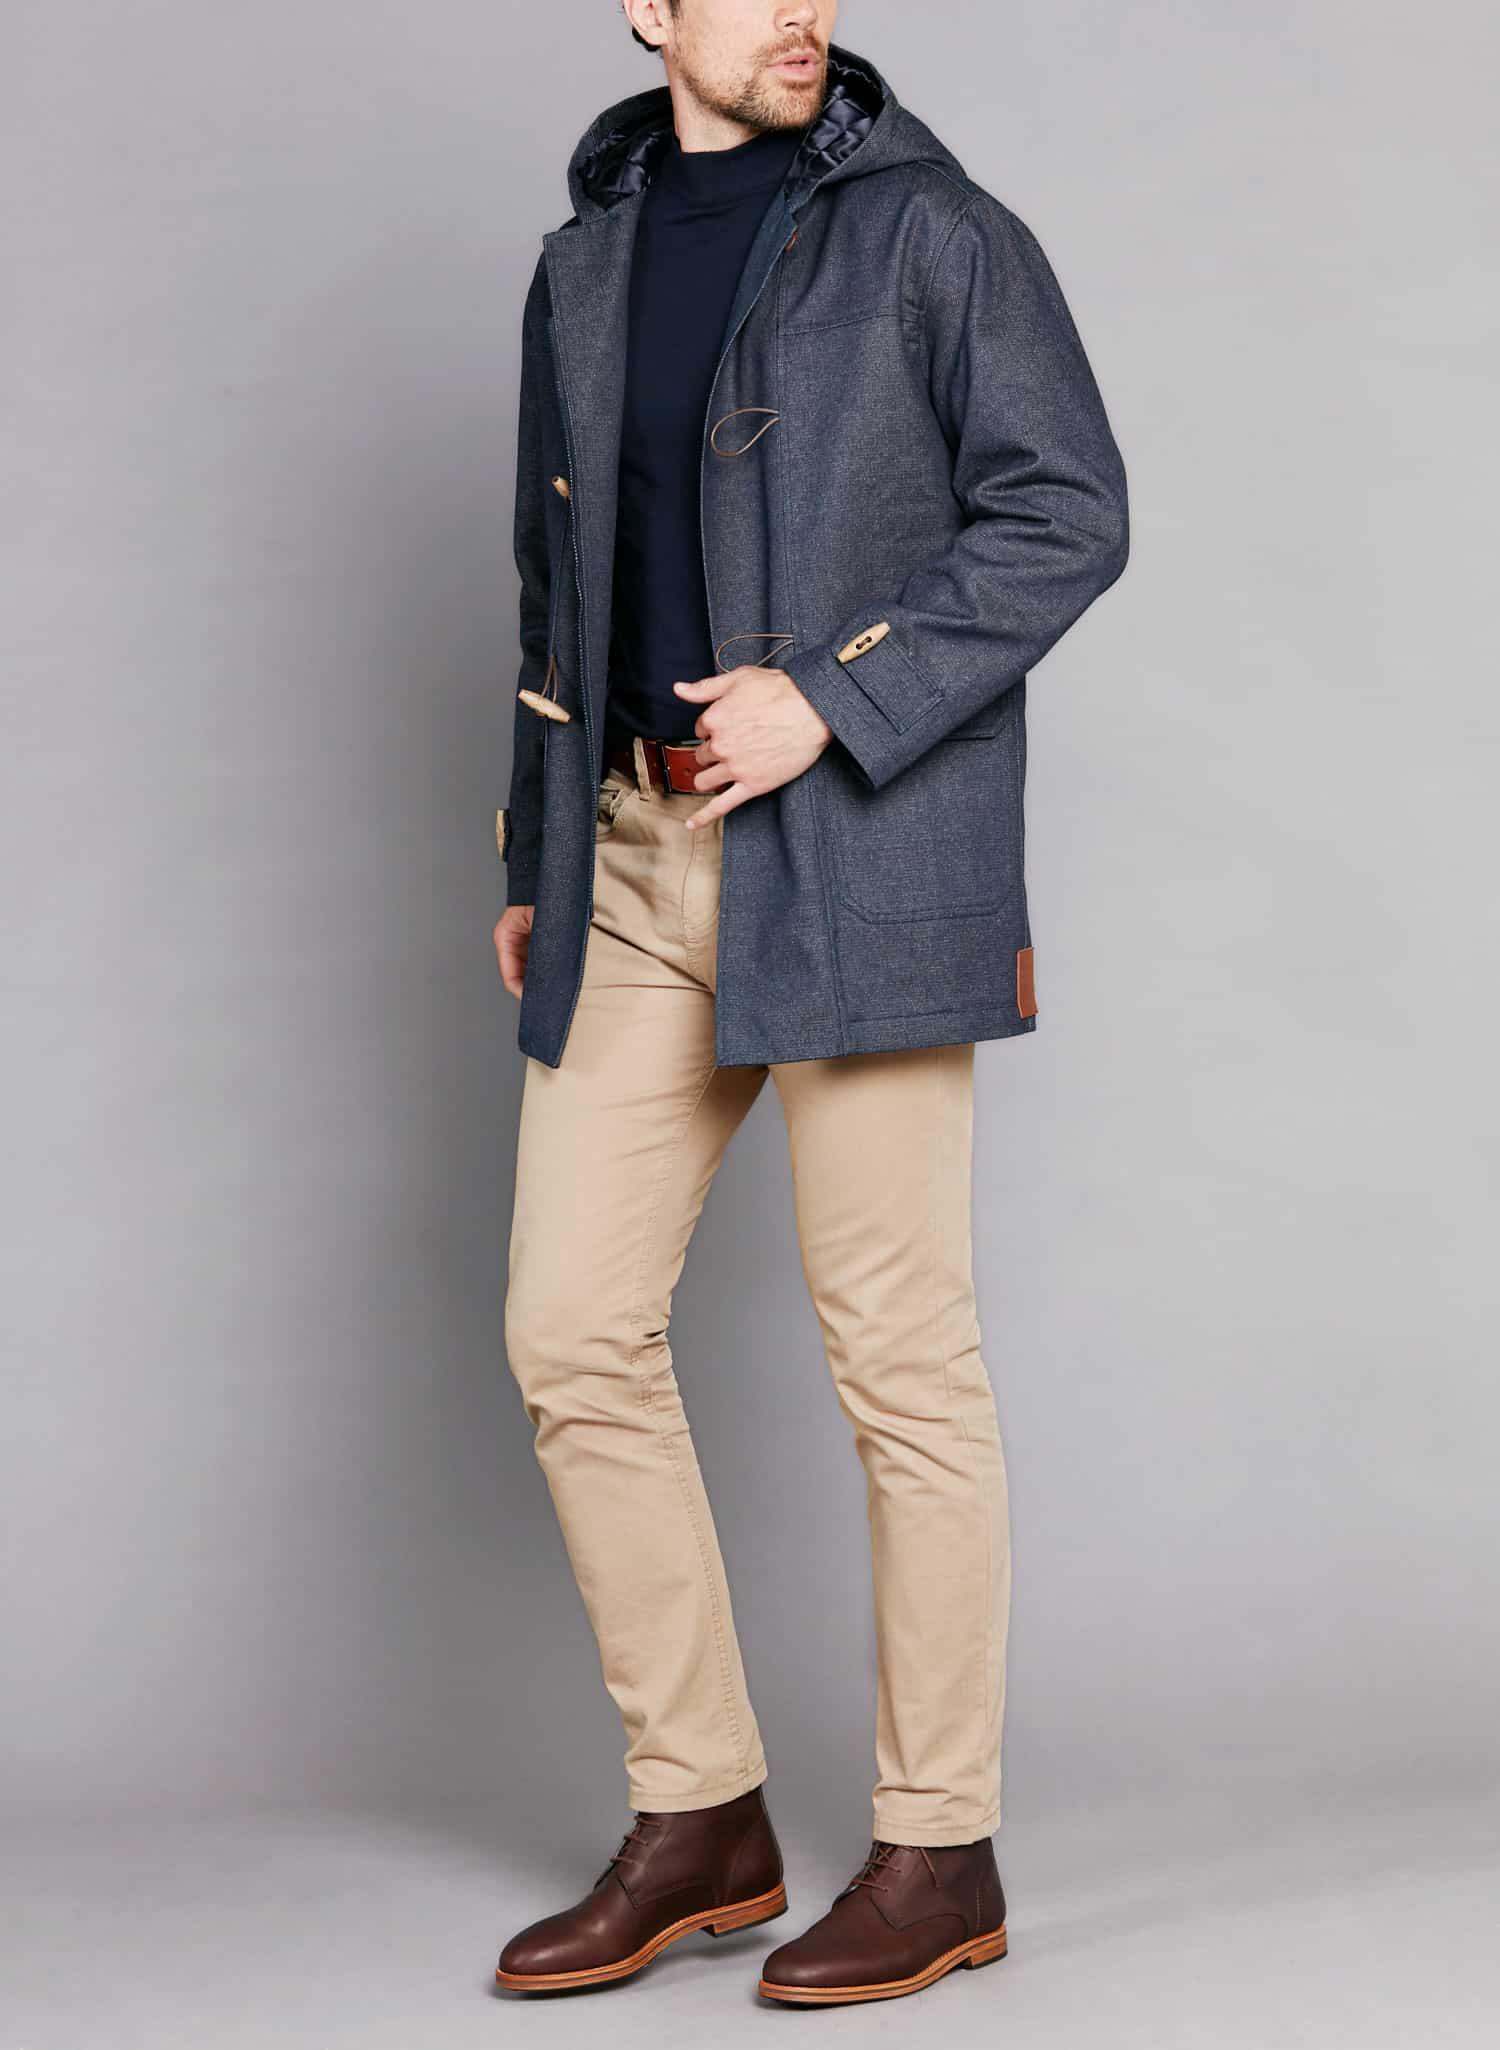 atelier tuffery veste duffle coat manteau denim jean femme homme laine locale francais - Atelier TUFFERY